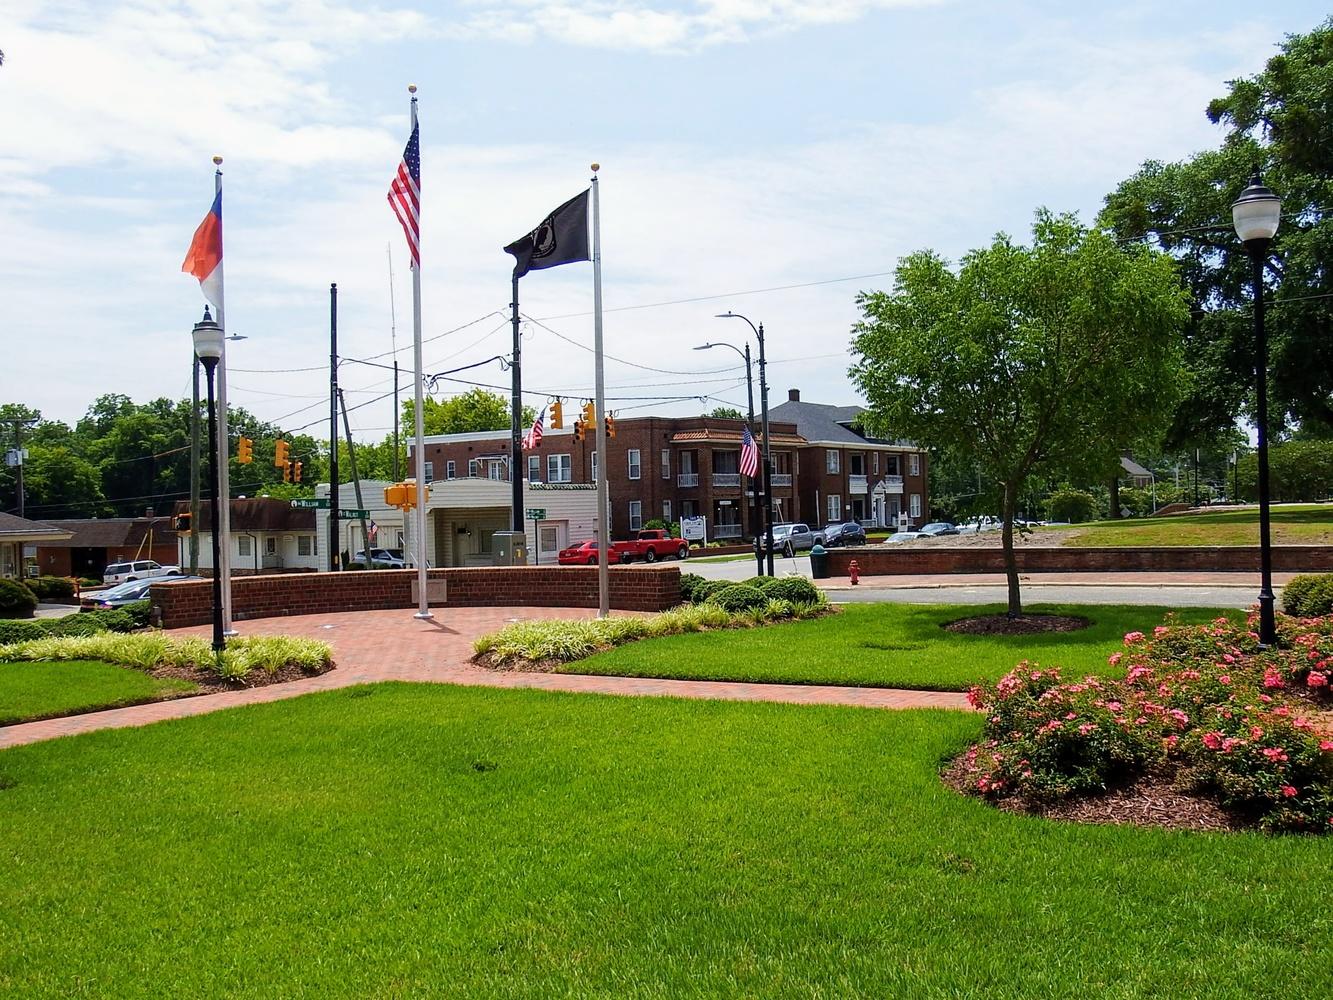 Veterans Memorial by Michael Lewis